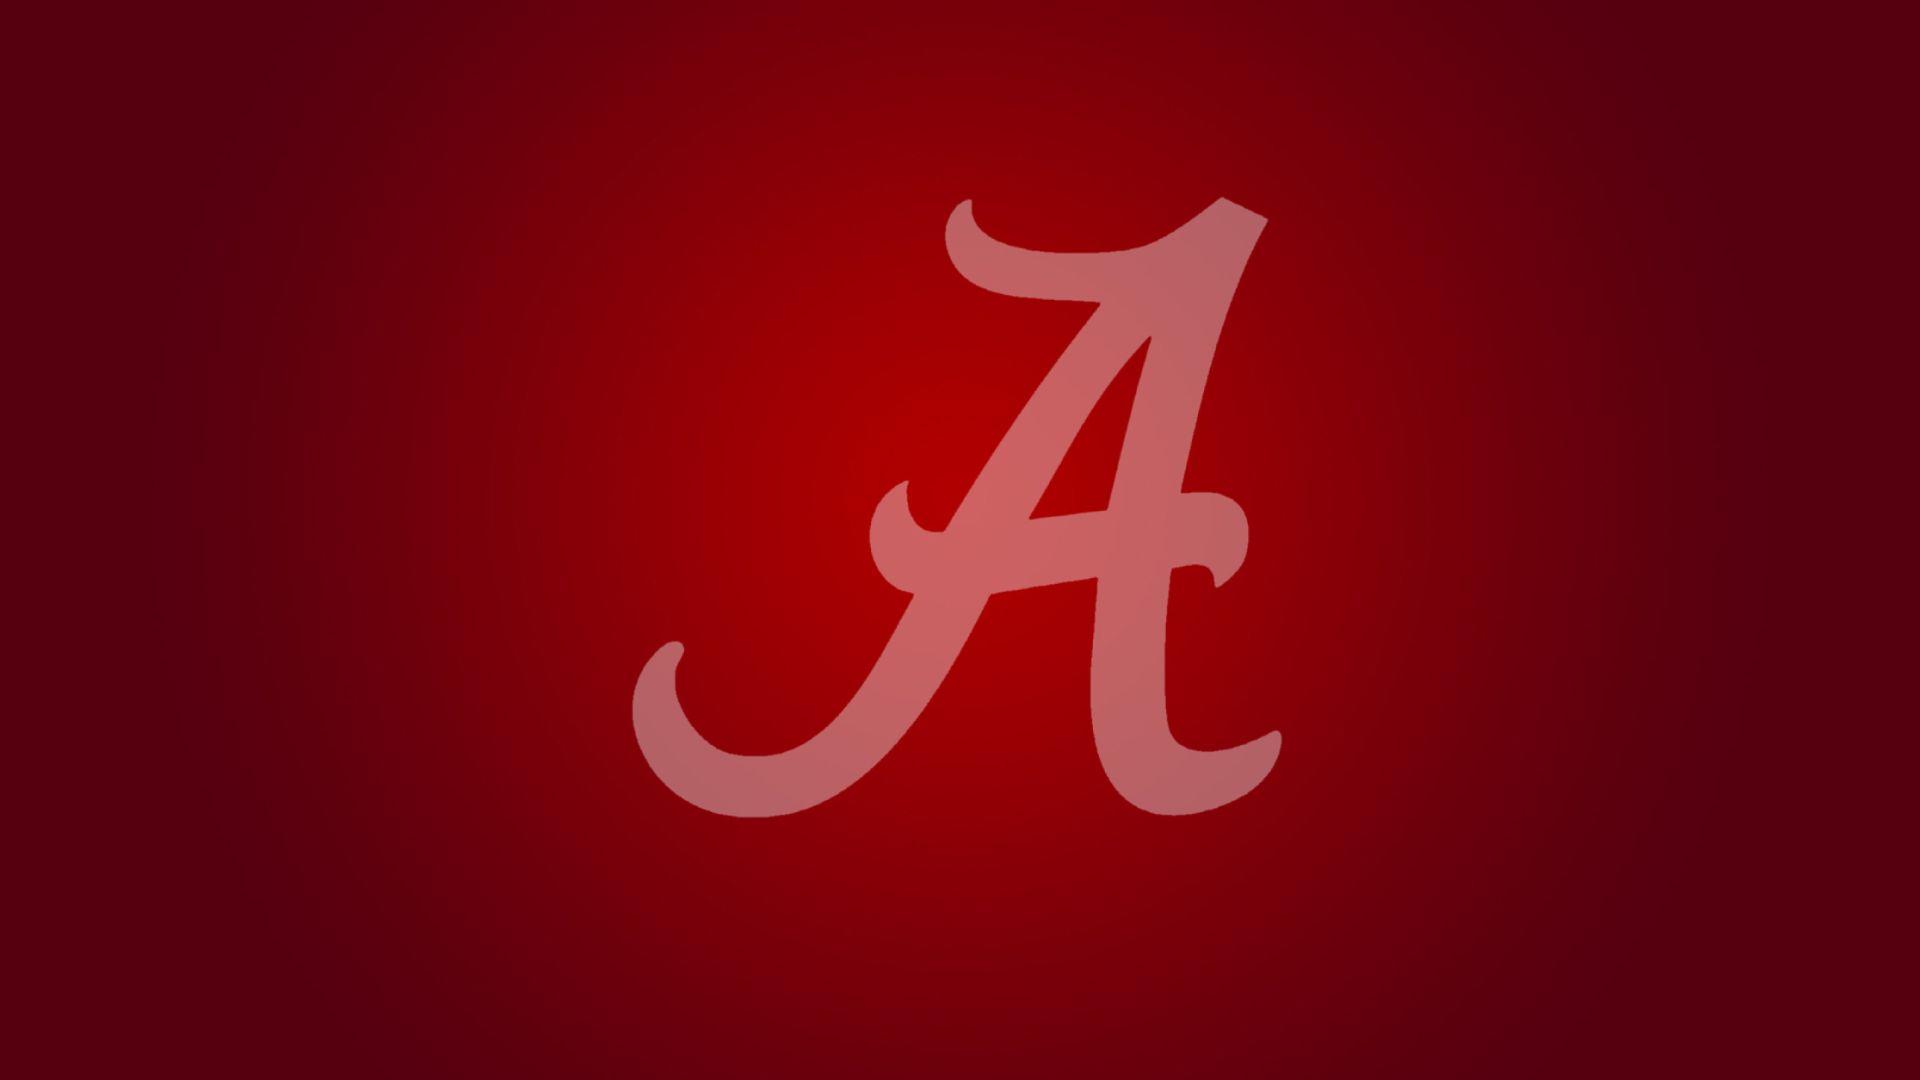 Alabama Crimson Tide 3